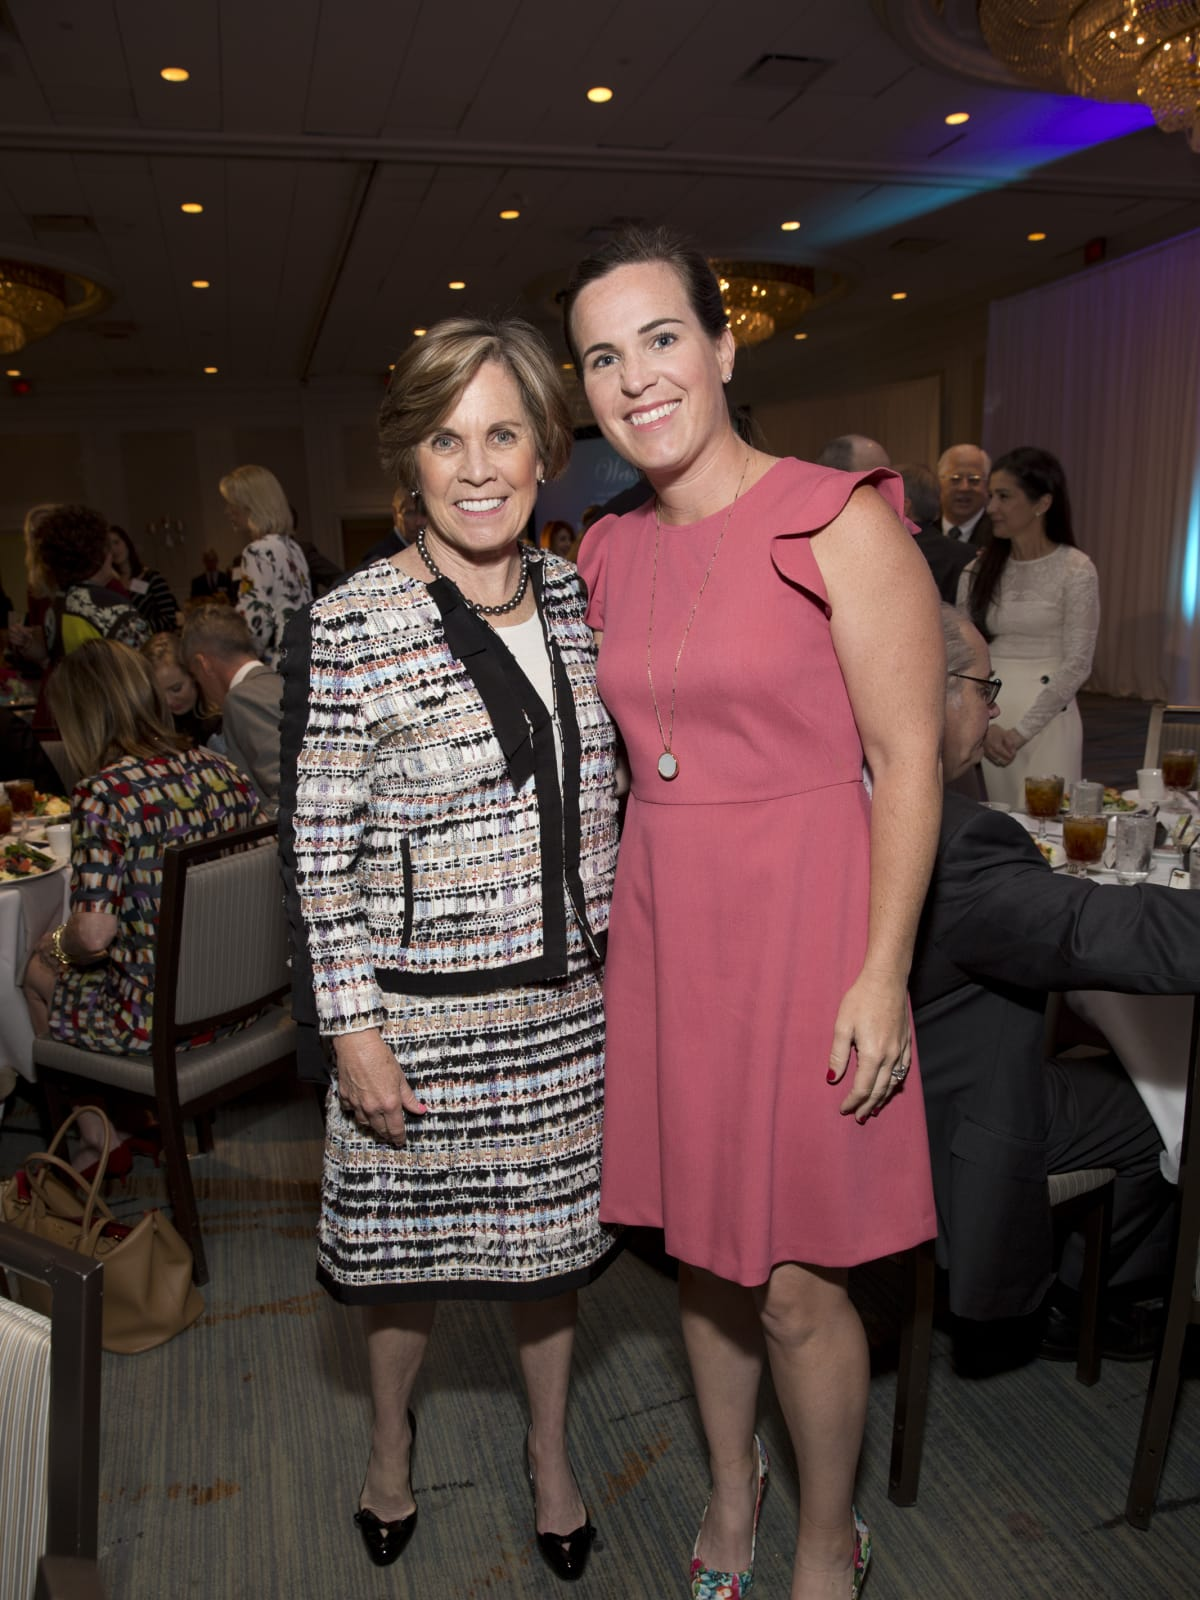 Maureen Hackett, Molly LaFauci at Menninger Clinic luncheon